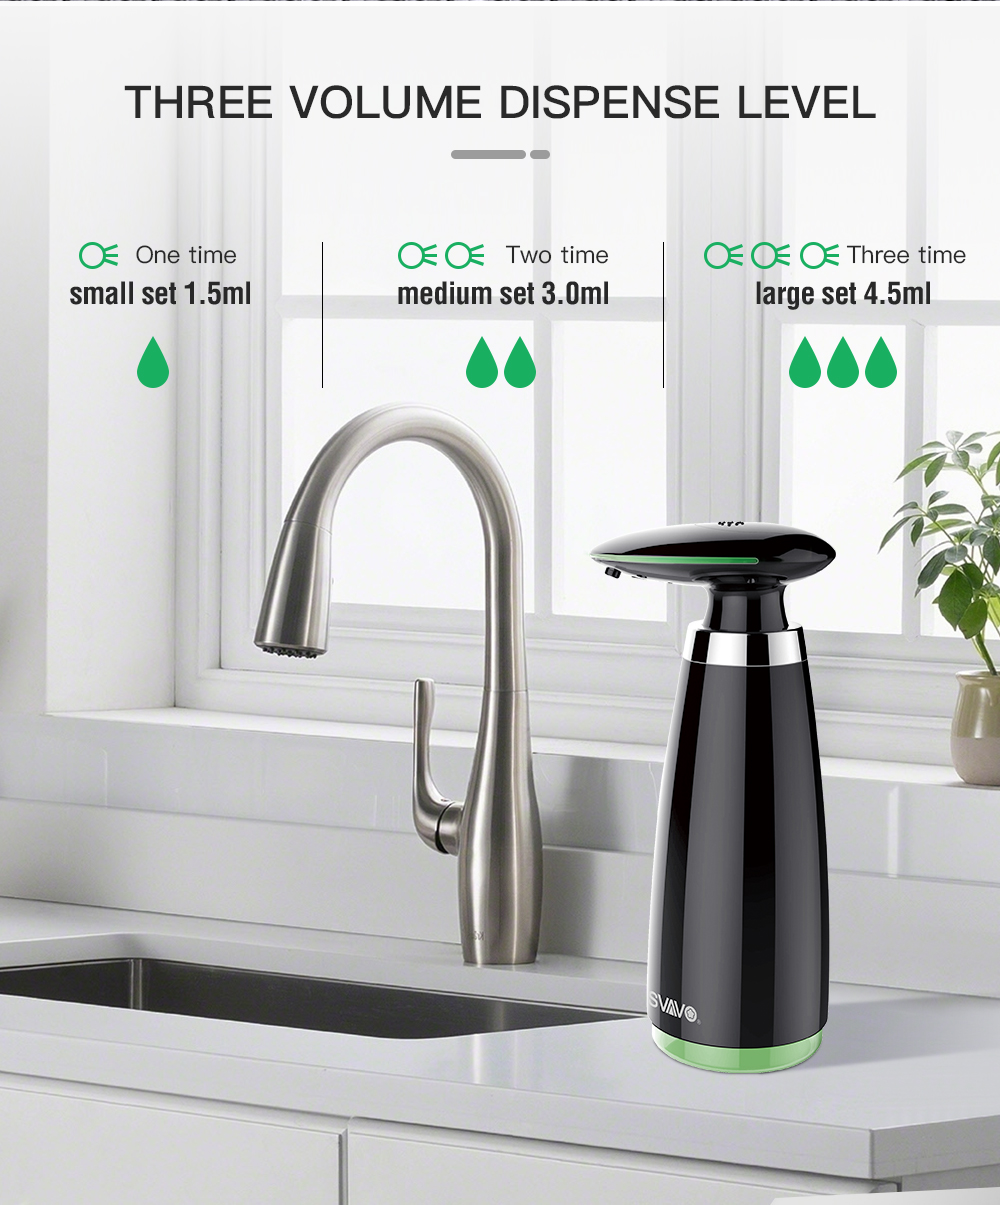 Ha54b184bea6f479cb28bf49f98e896ebi SVAVO 350ml Automatic Soap Dispenser Infrared Touchless Motion Bathroom Dispenser Smart Sensor Liquid Soap Dispenser for Kitchen